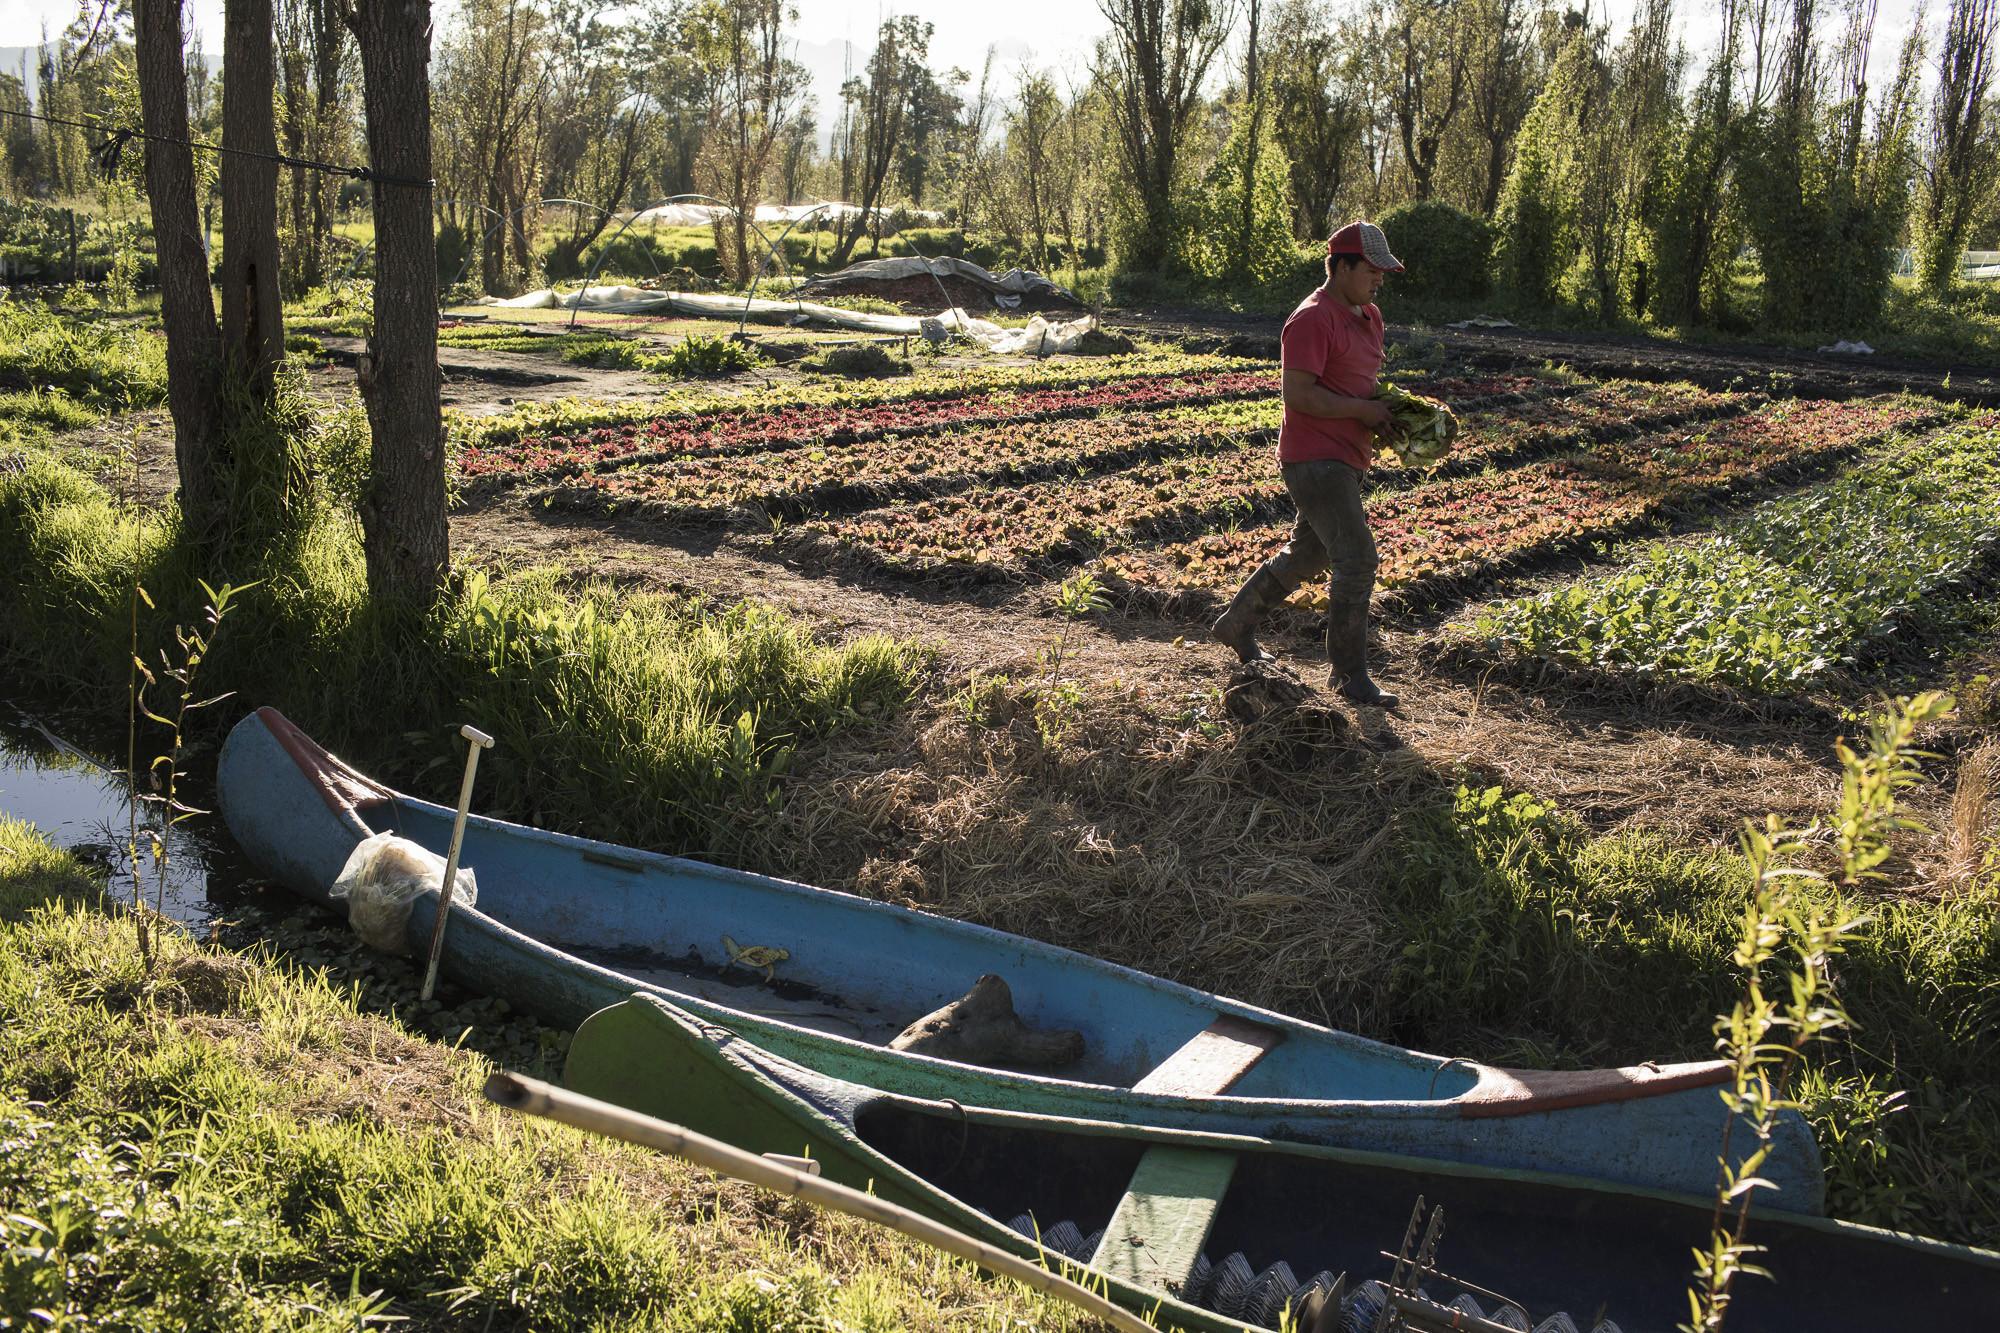 la-fg-mexico-farming